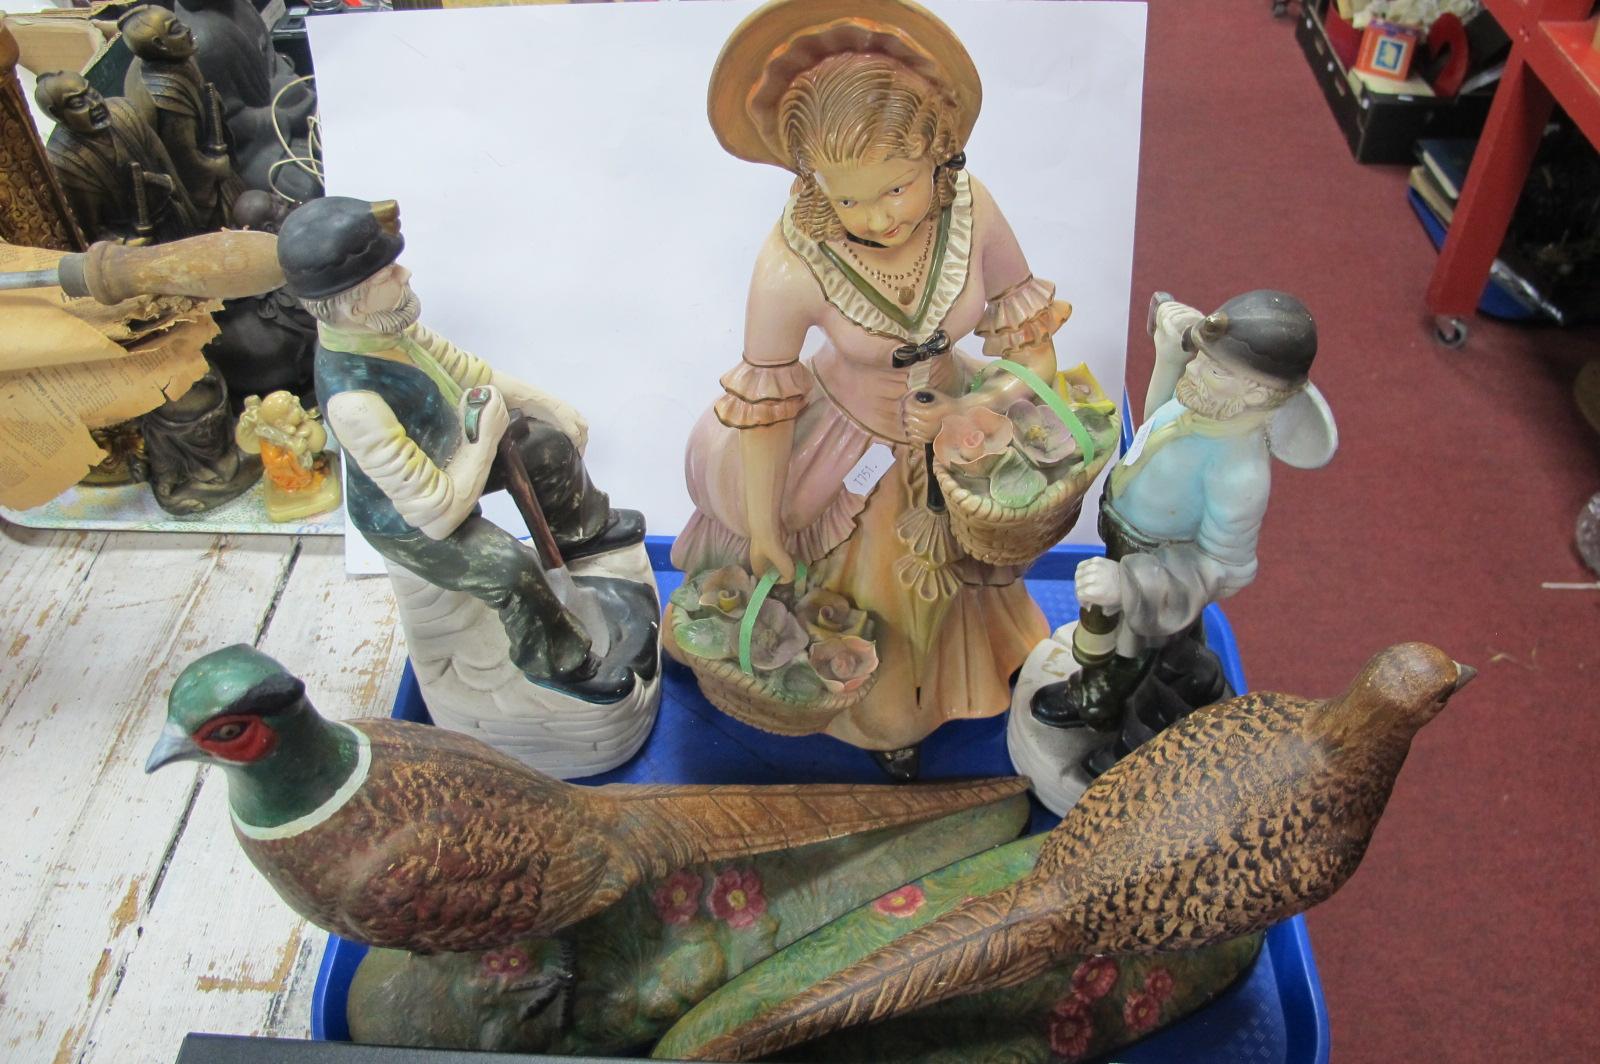 Plaster Figure of 1930's Lady, sporting bonnet, 41cm high, pottery pheasants, workmen figures:-